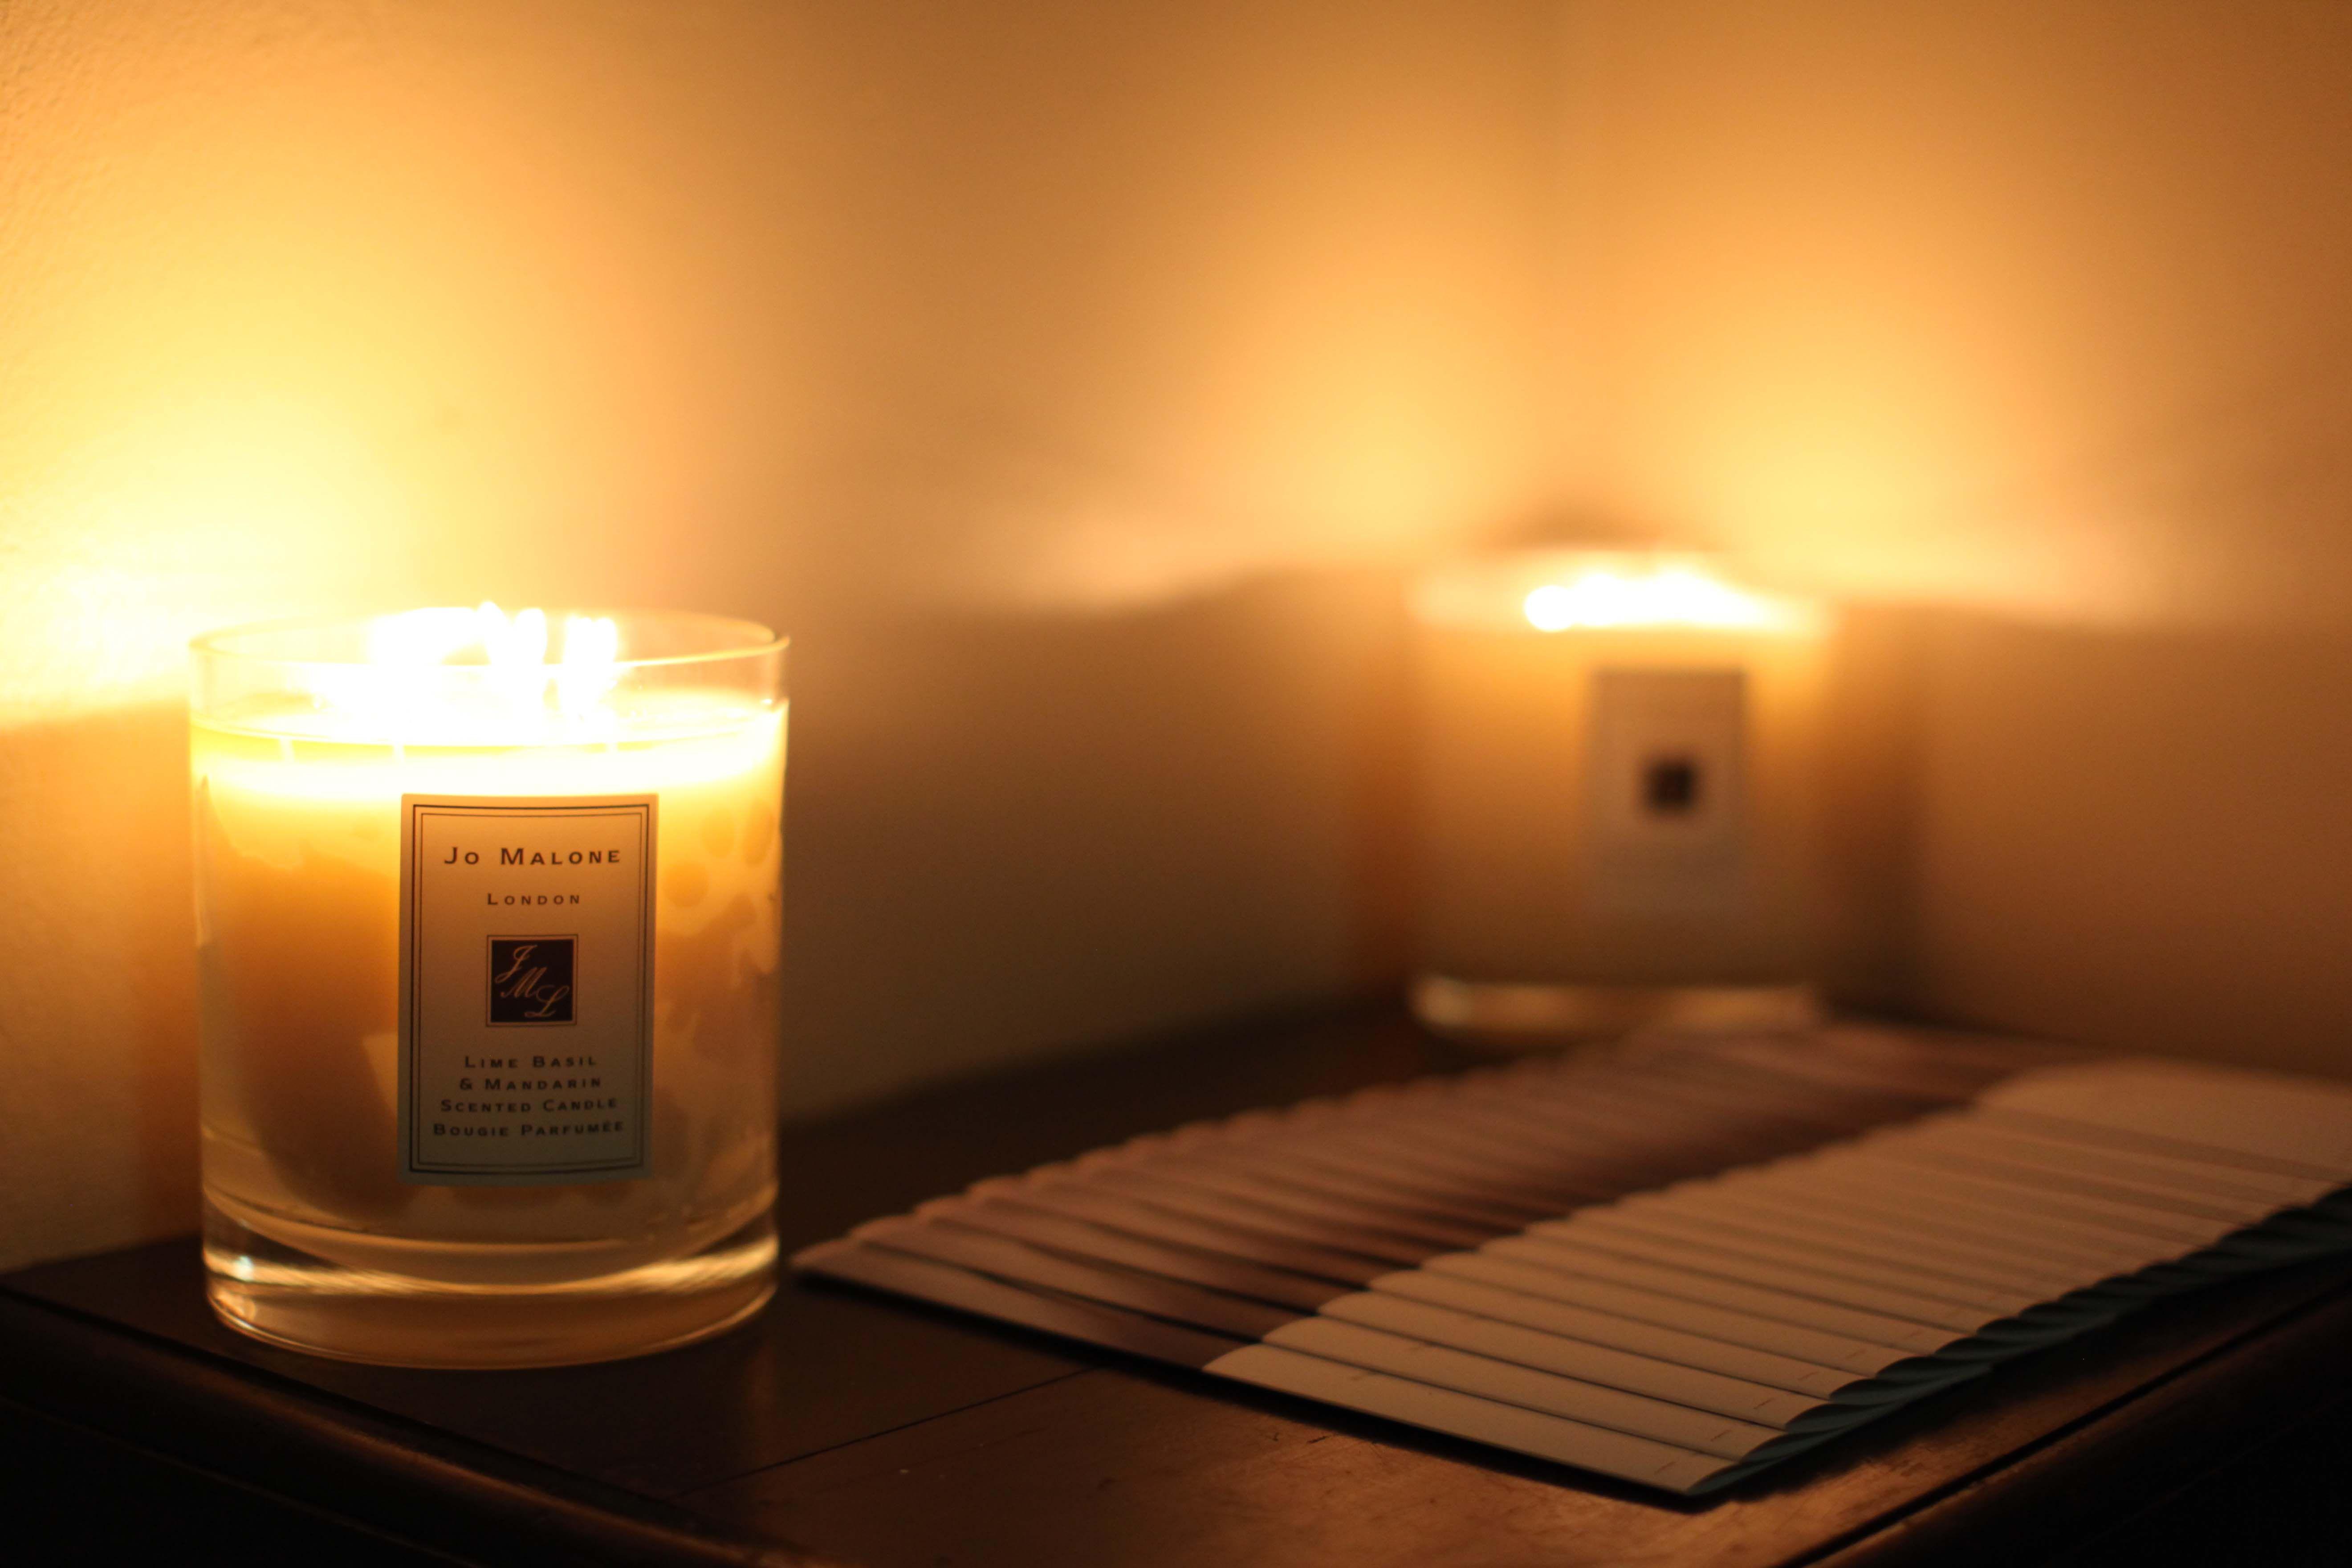 jo malone candles | juliette hogan winter 2014 collection show